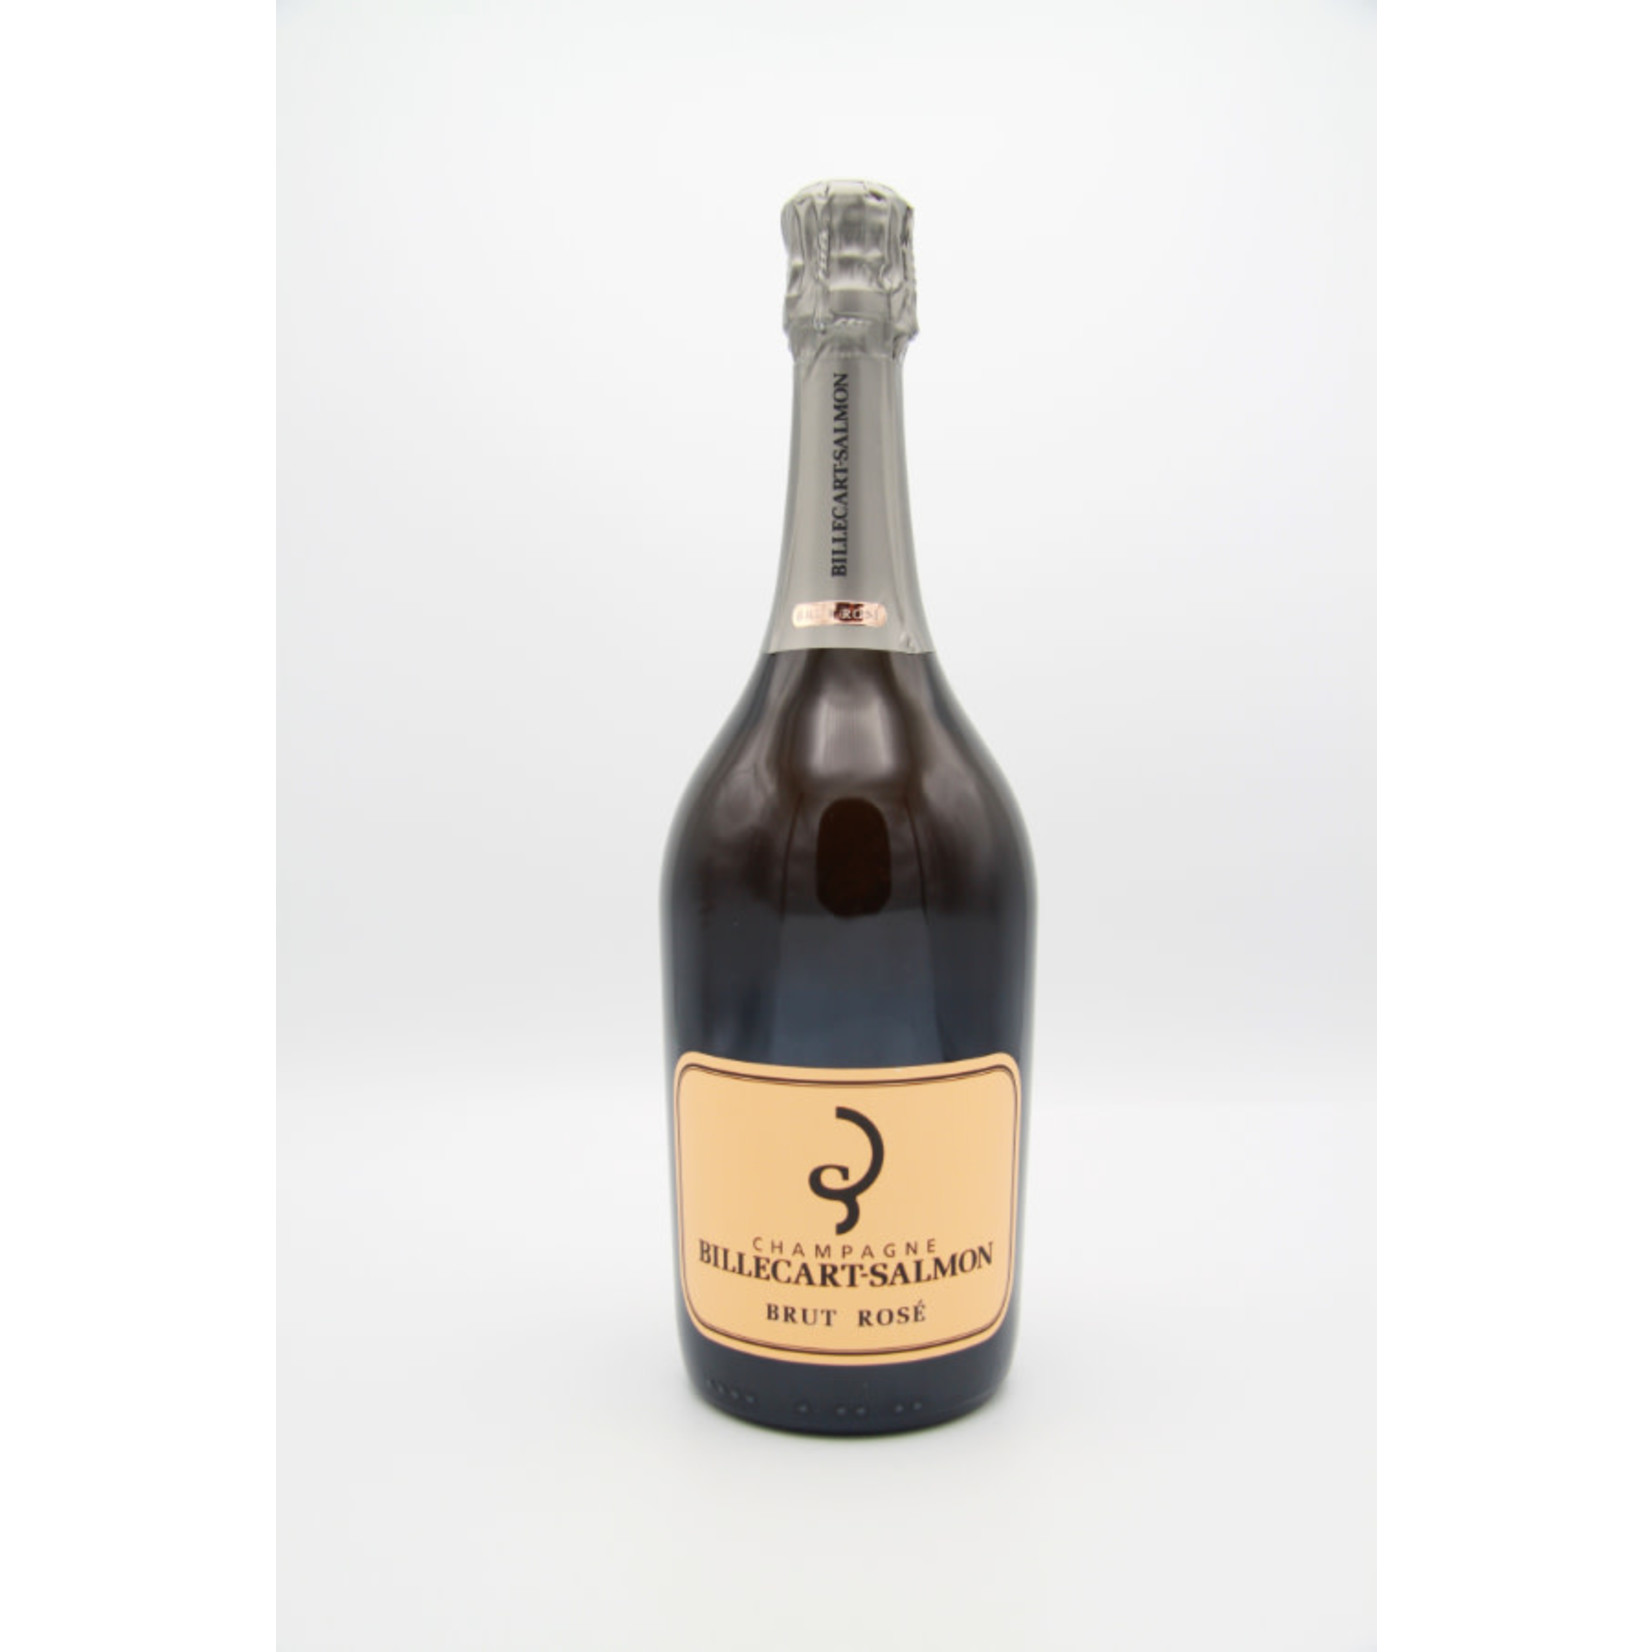 NV Billecart-Salmon Brut Rosé